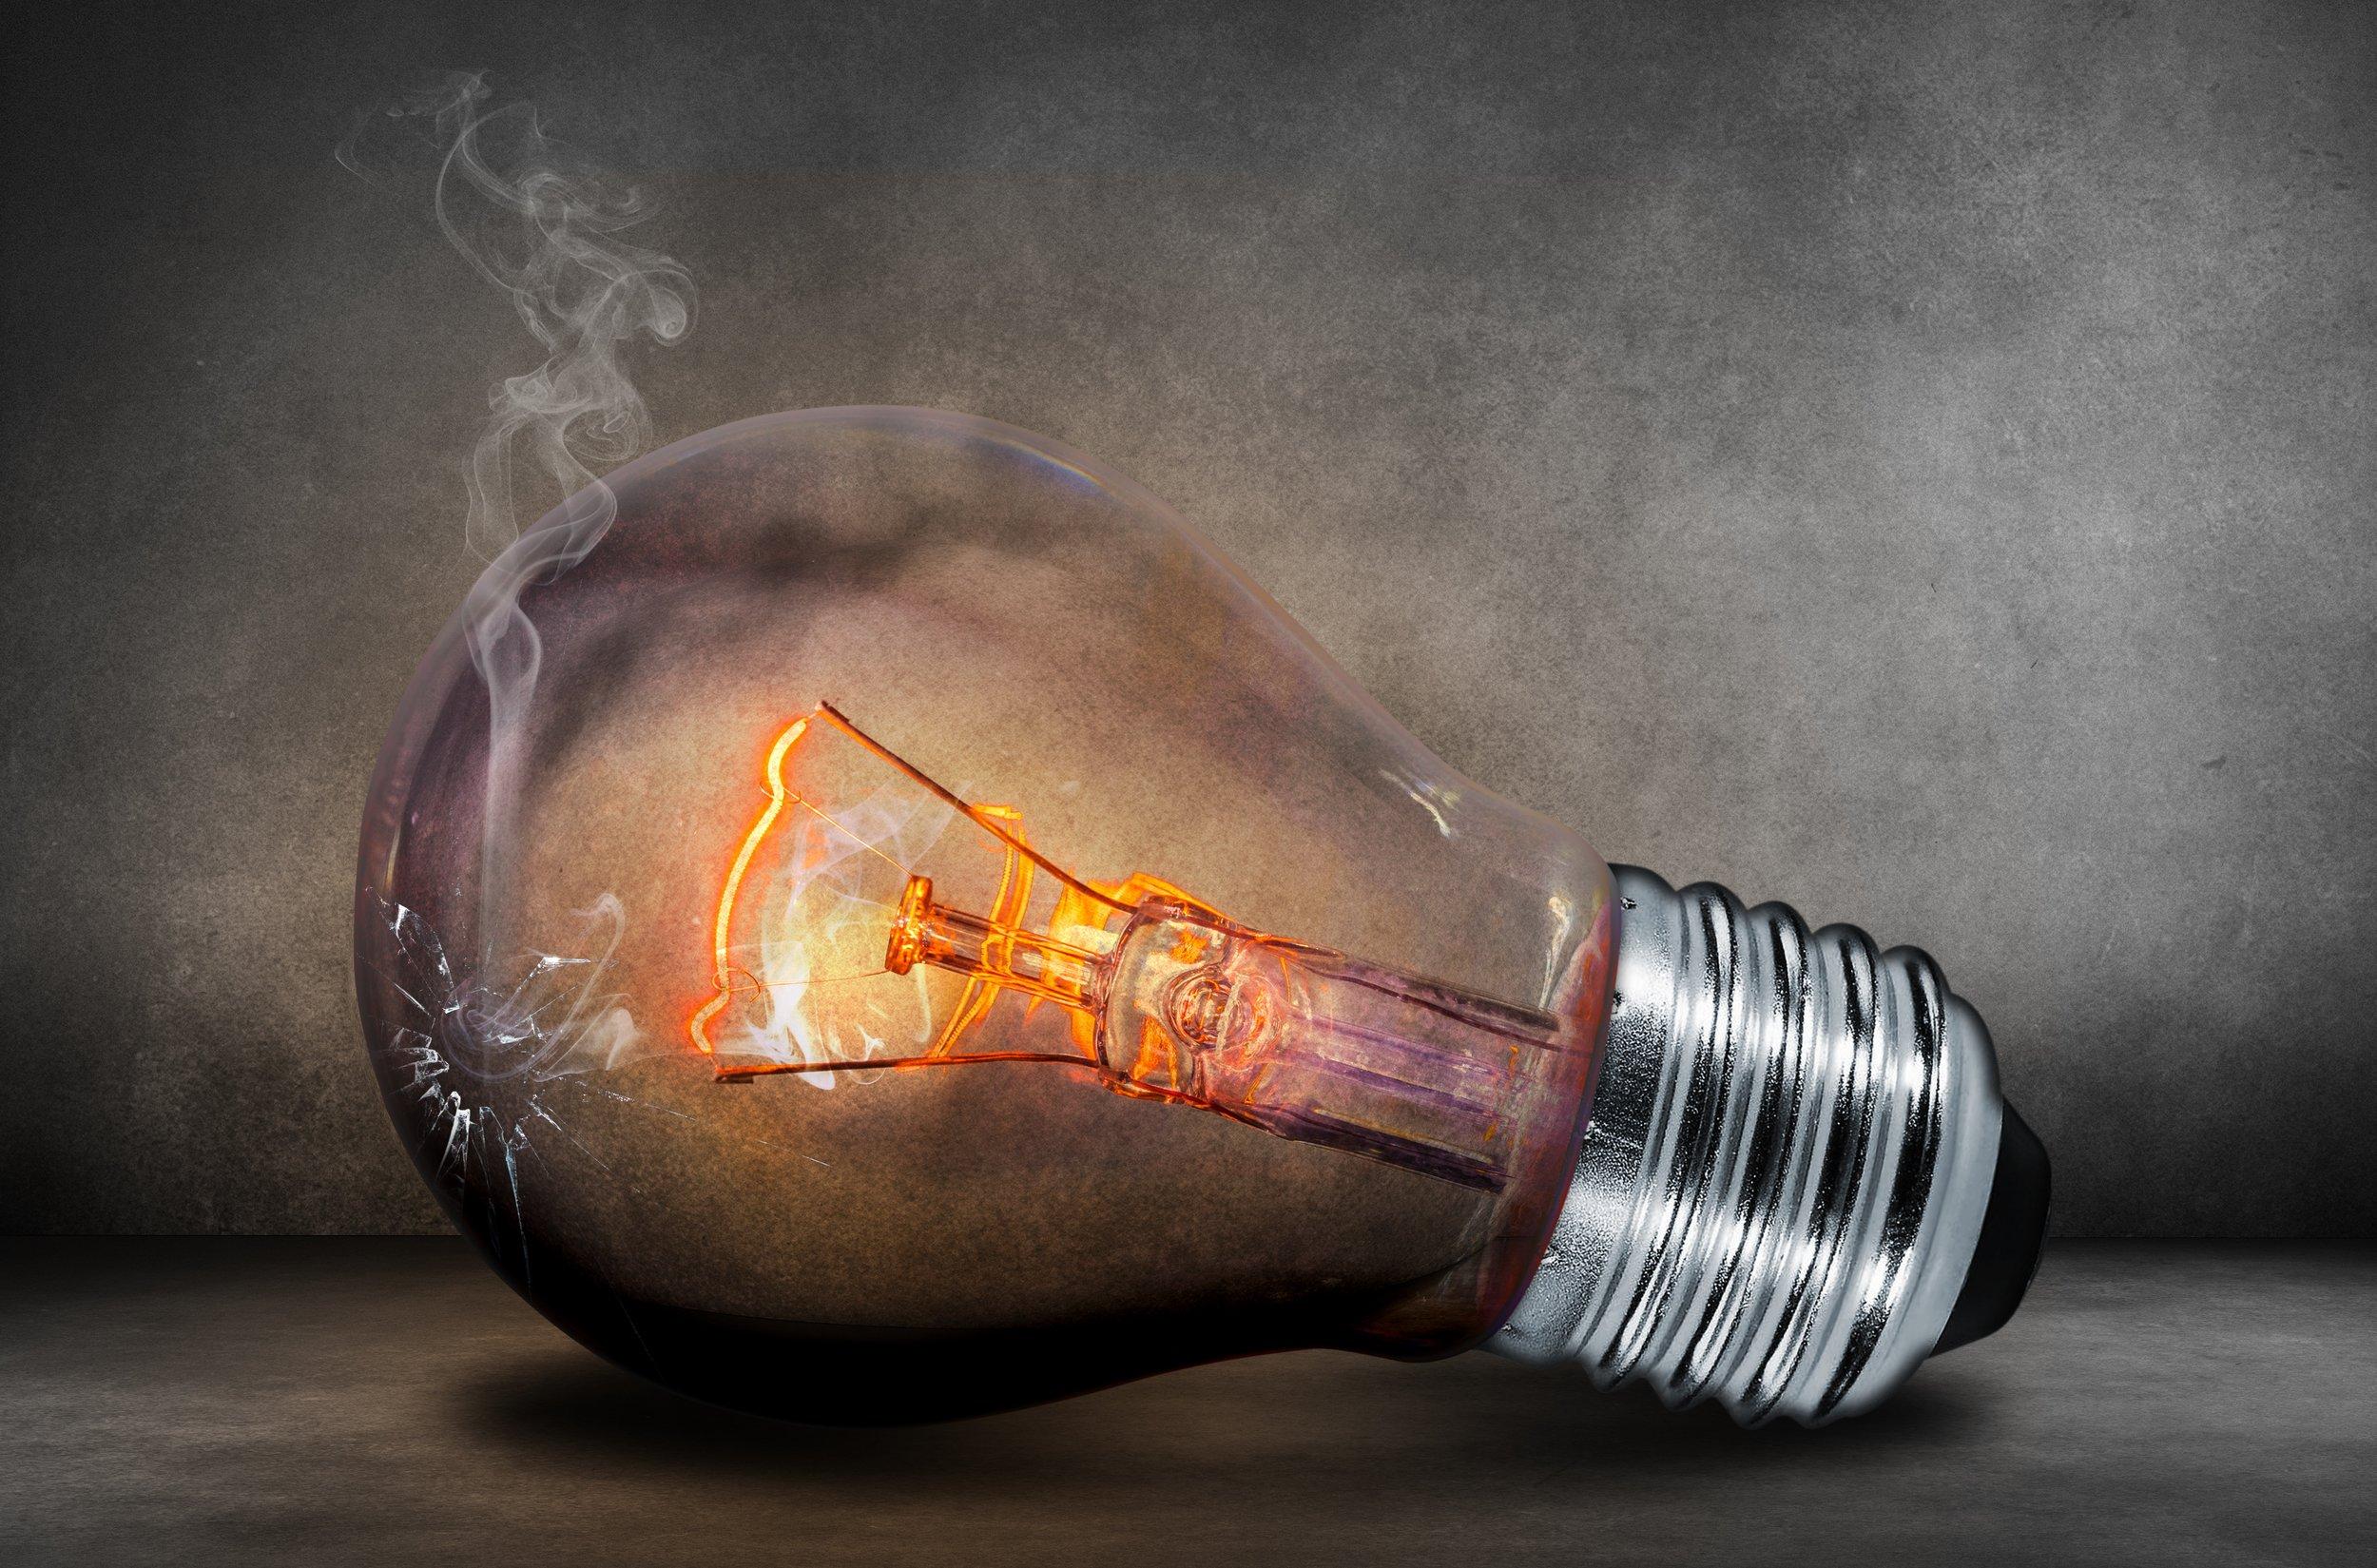 light-bulb-current-light-glow-40889.jpeg